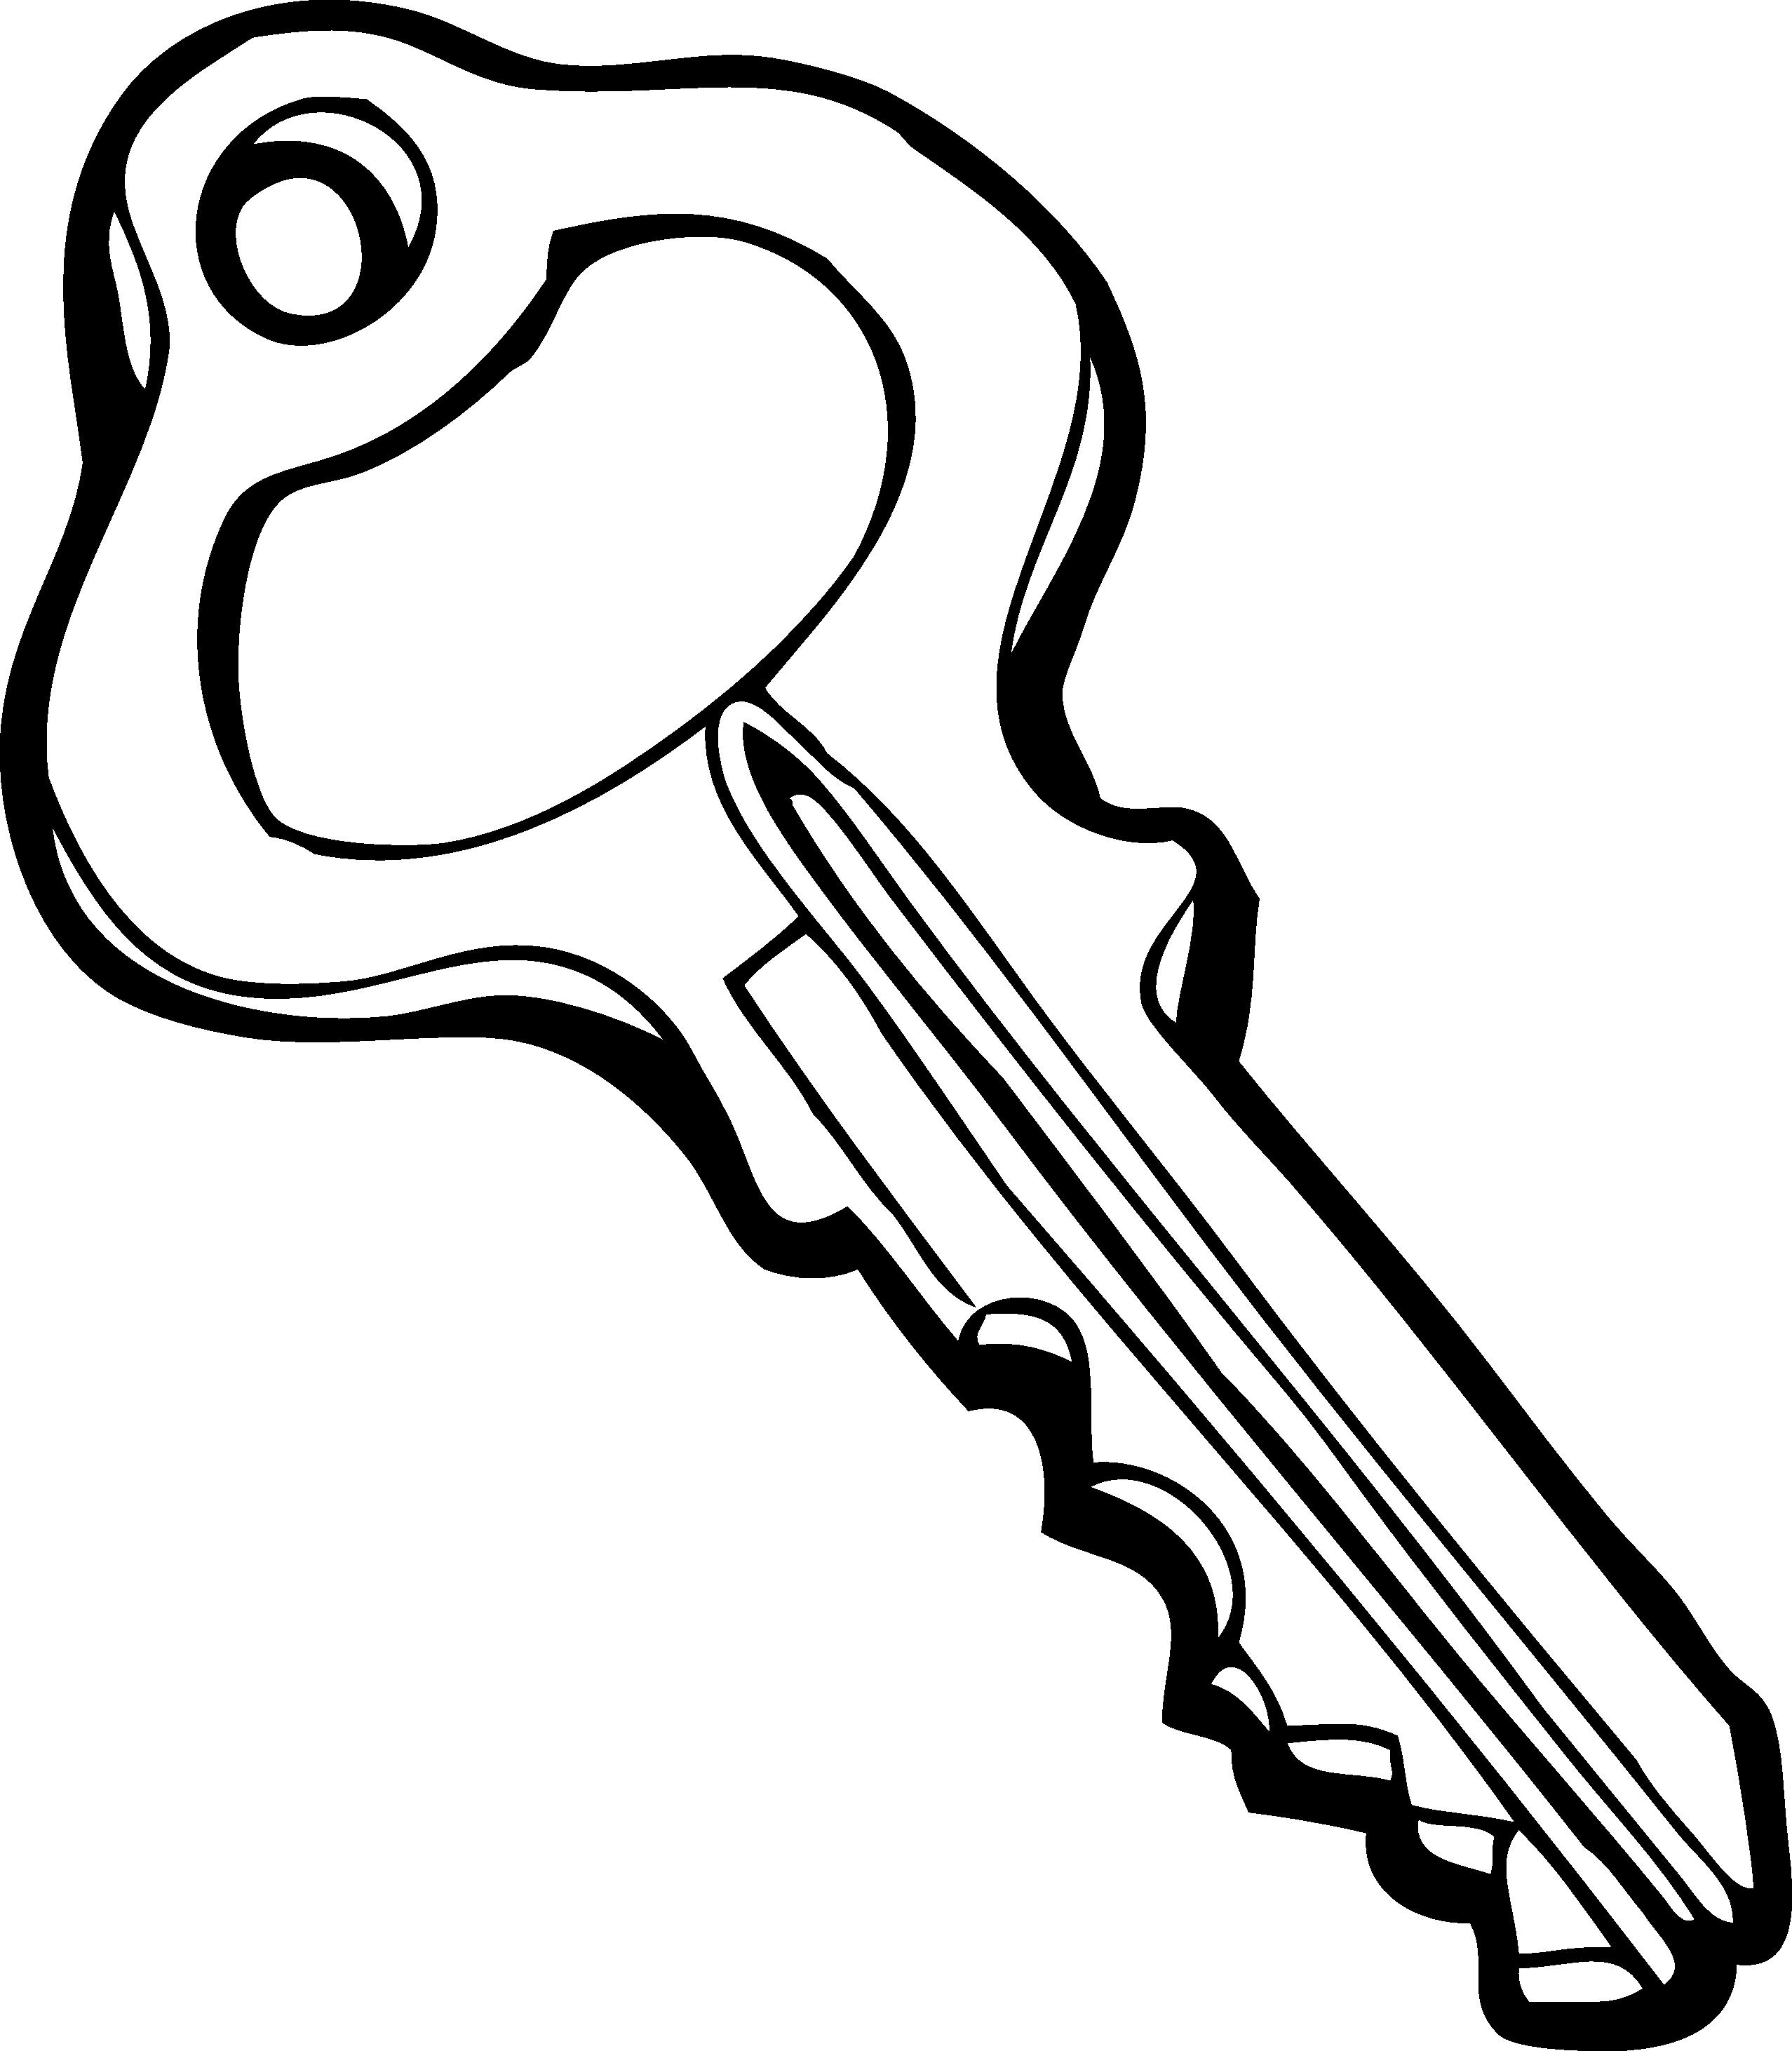 Key Clip Art Black And White